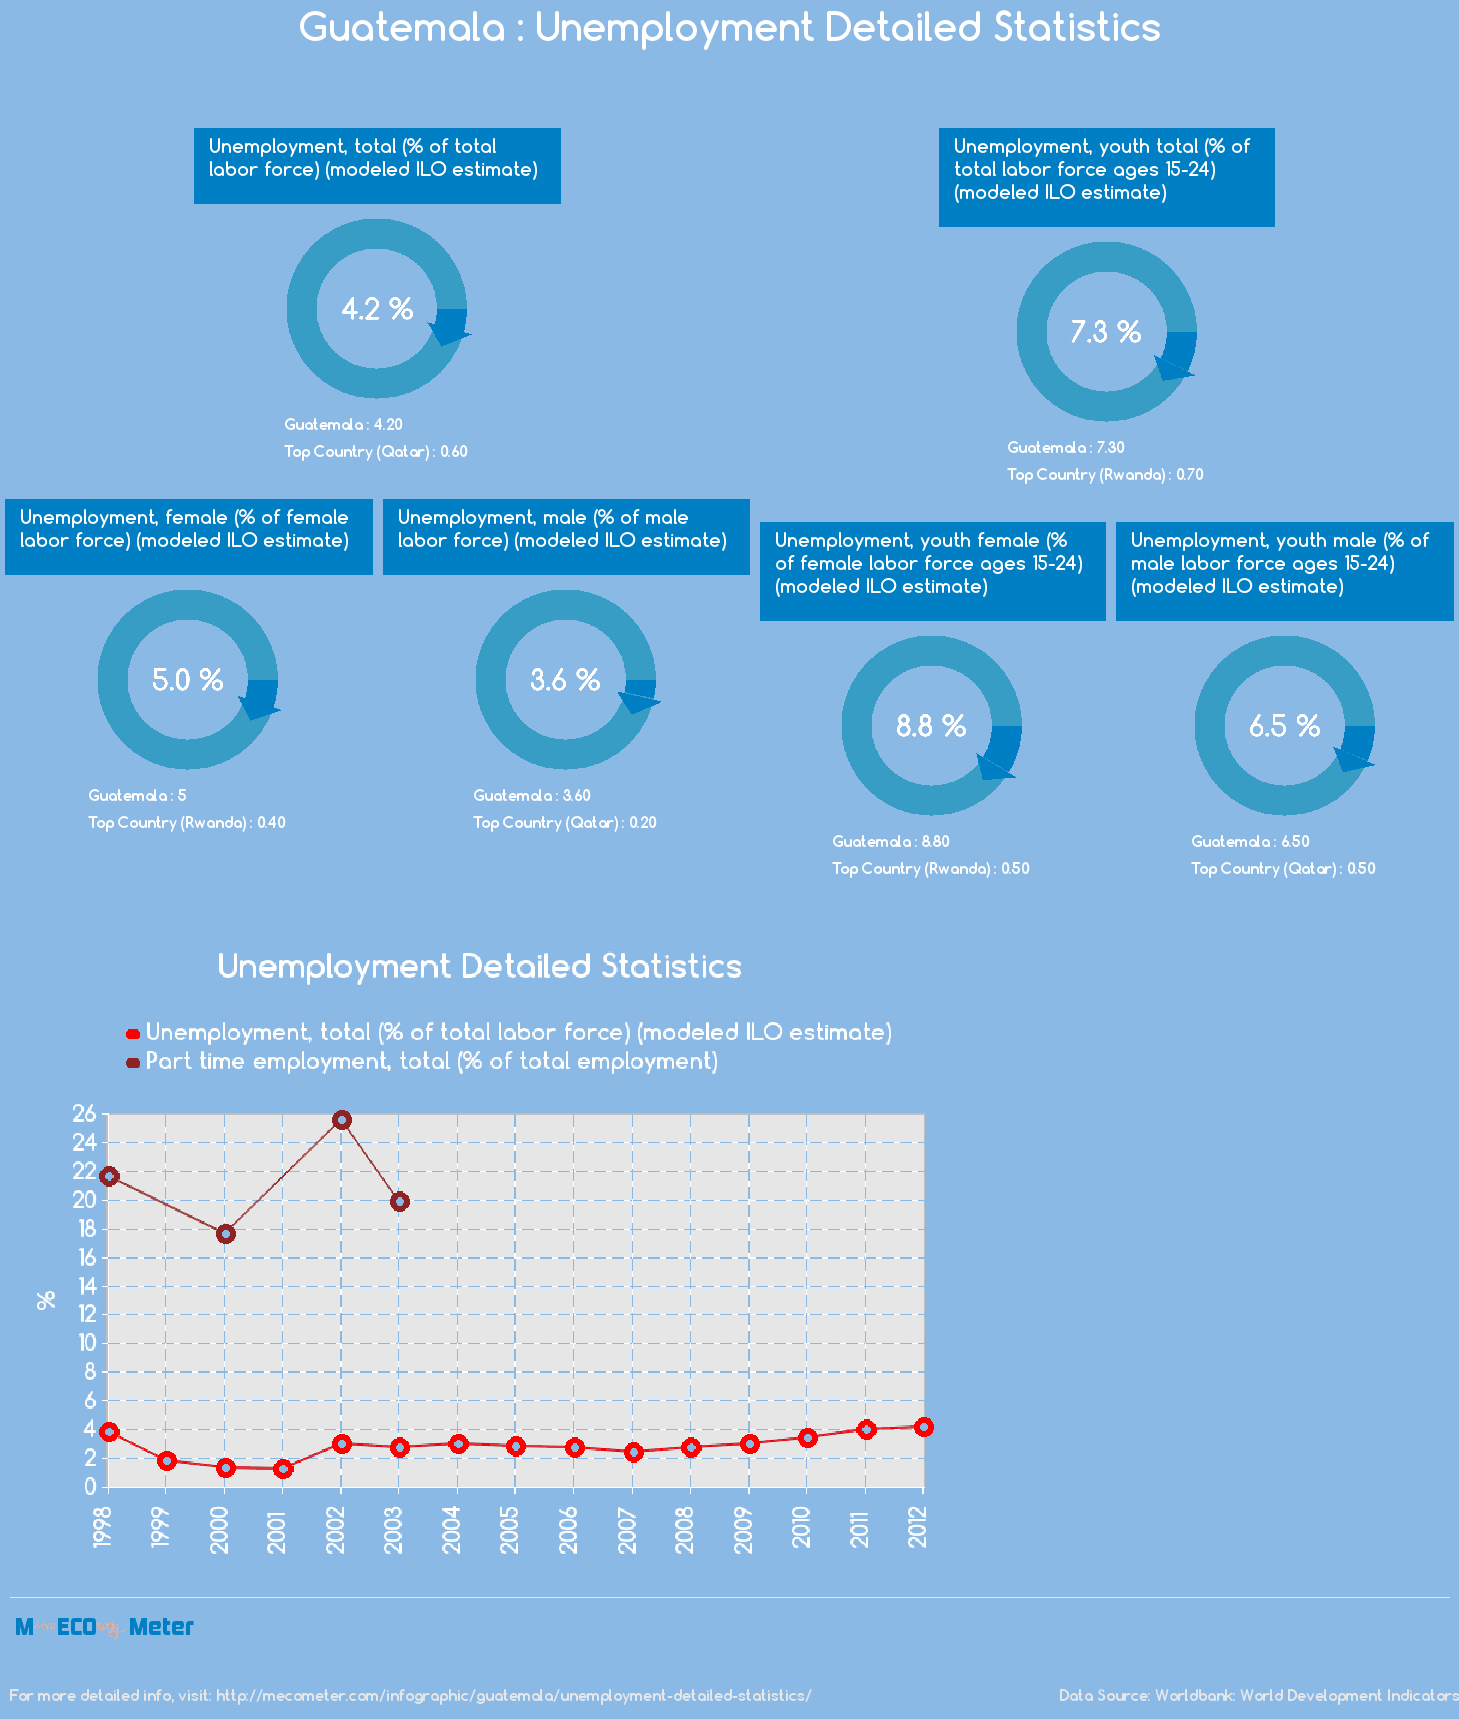 Guatemala : Unemployment Detailed Statistics